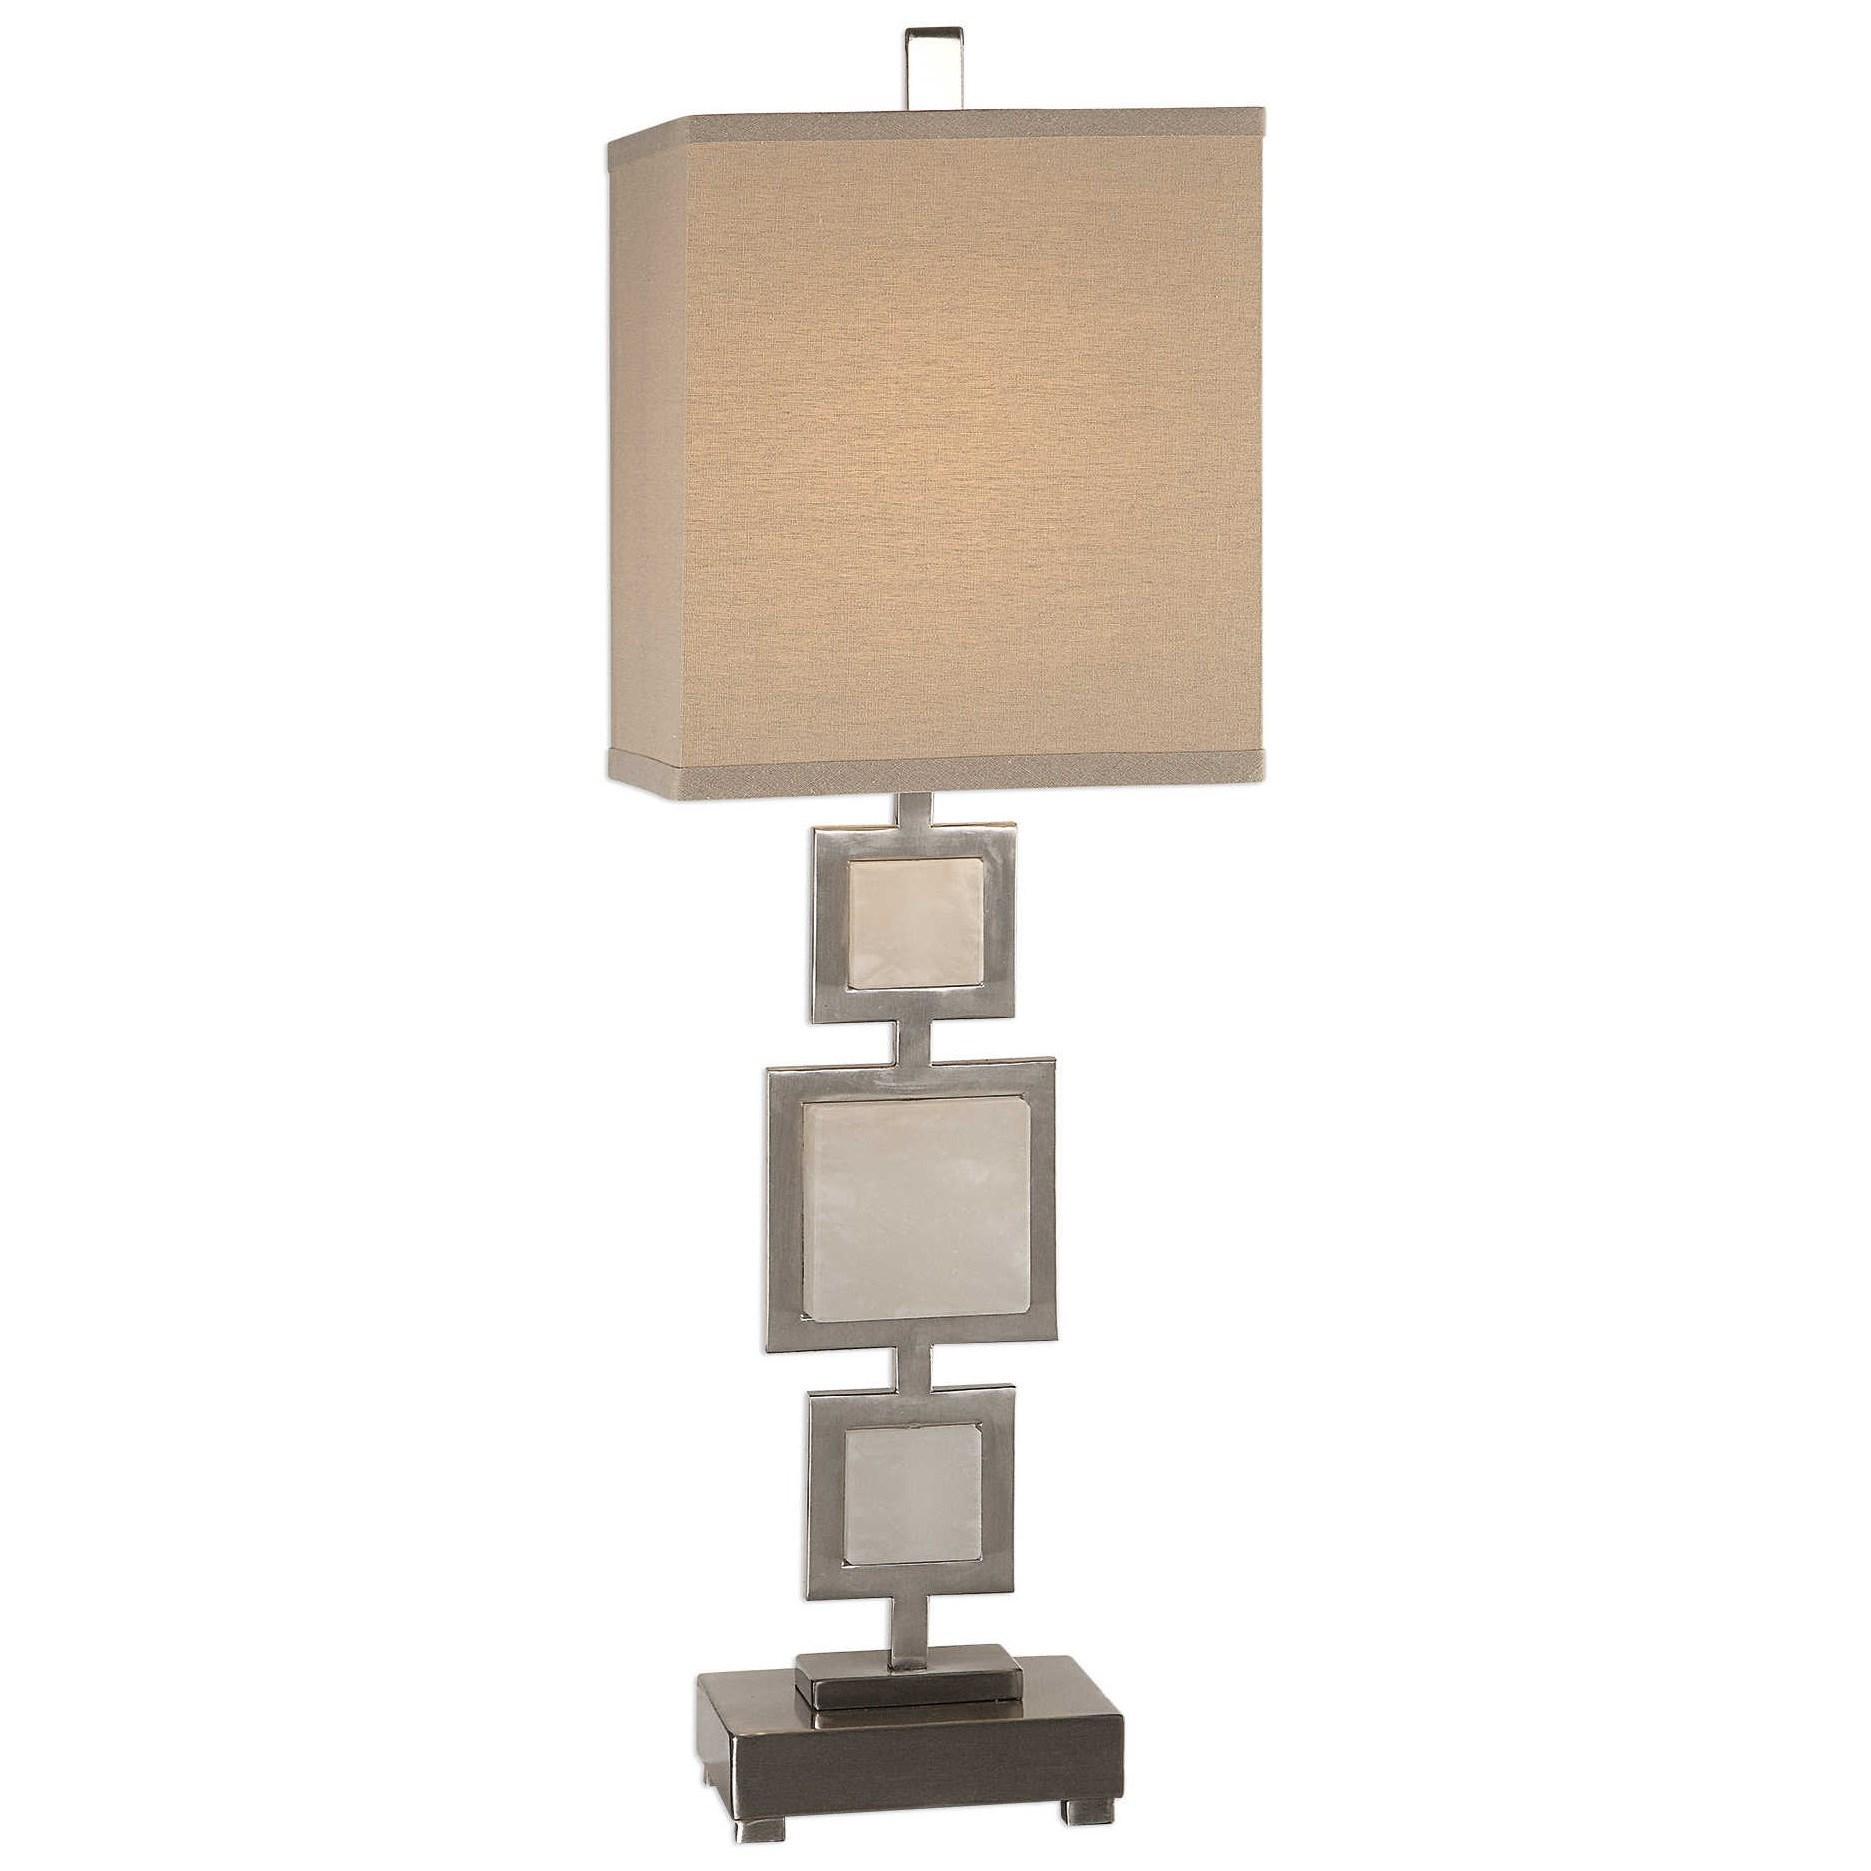 Idalgo Brushed Nickel Lamp